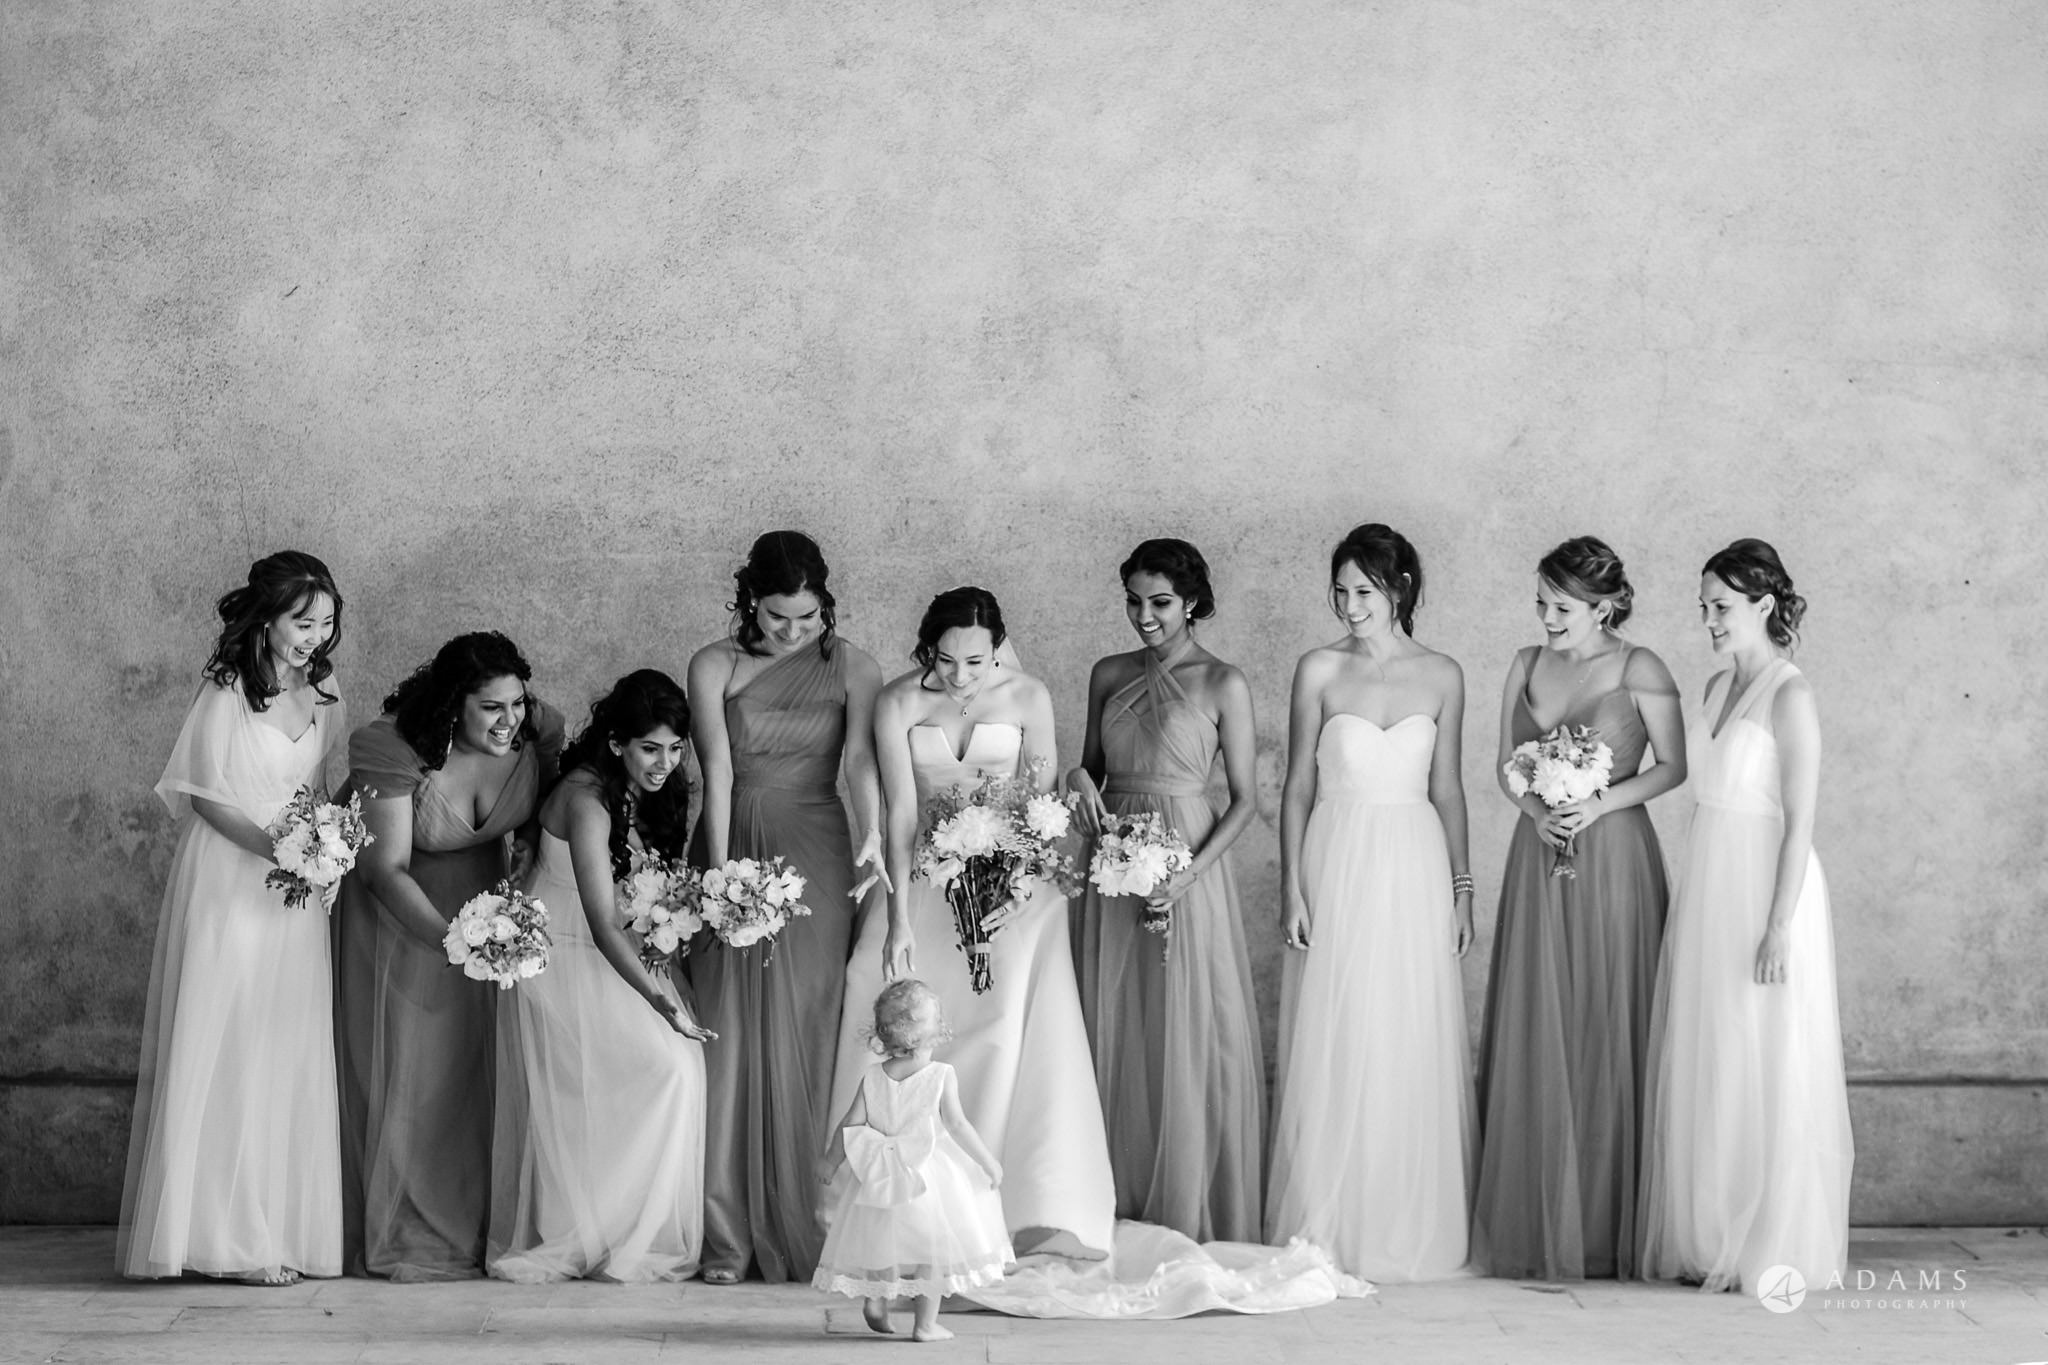 Trinity College Cambridge wedding bridal party portrait